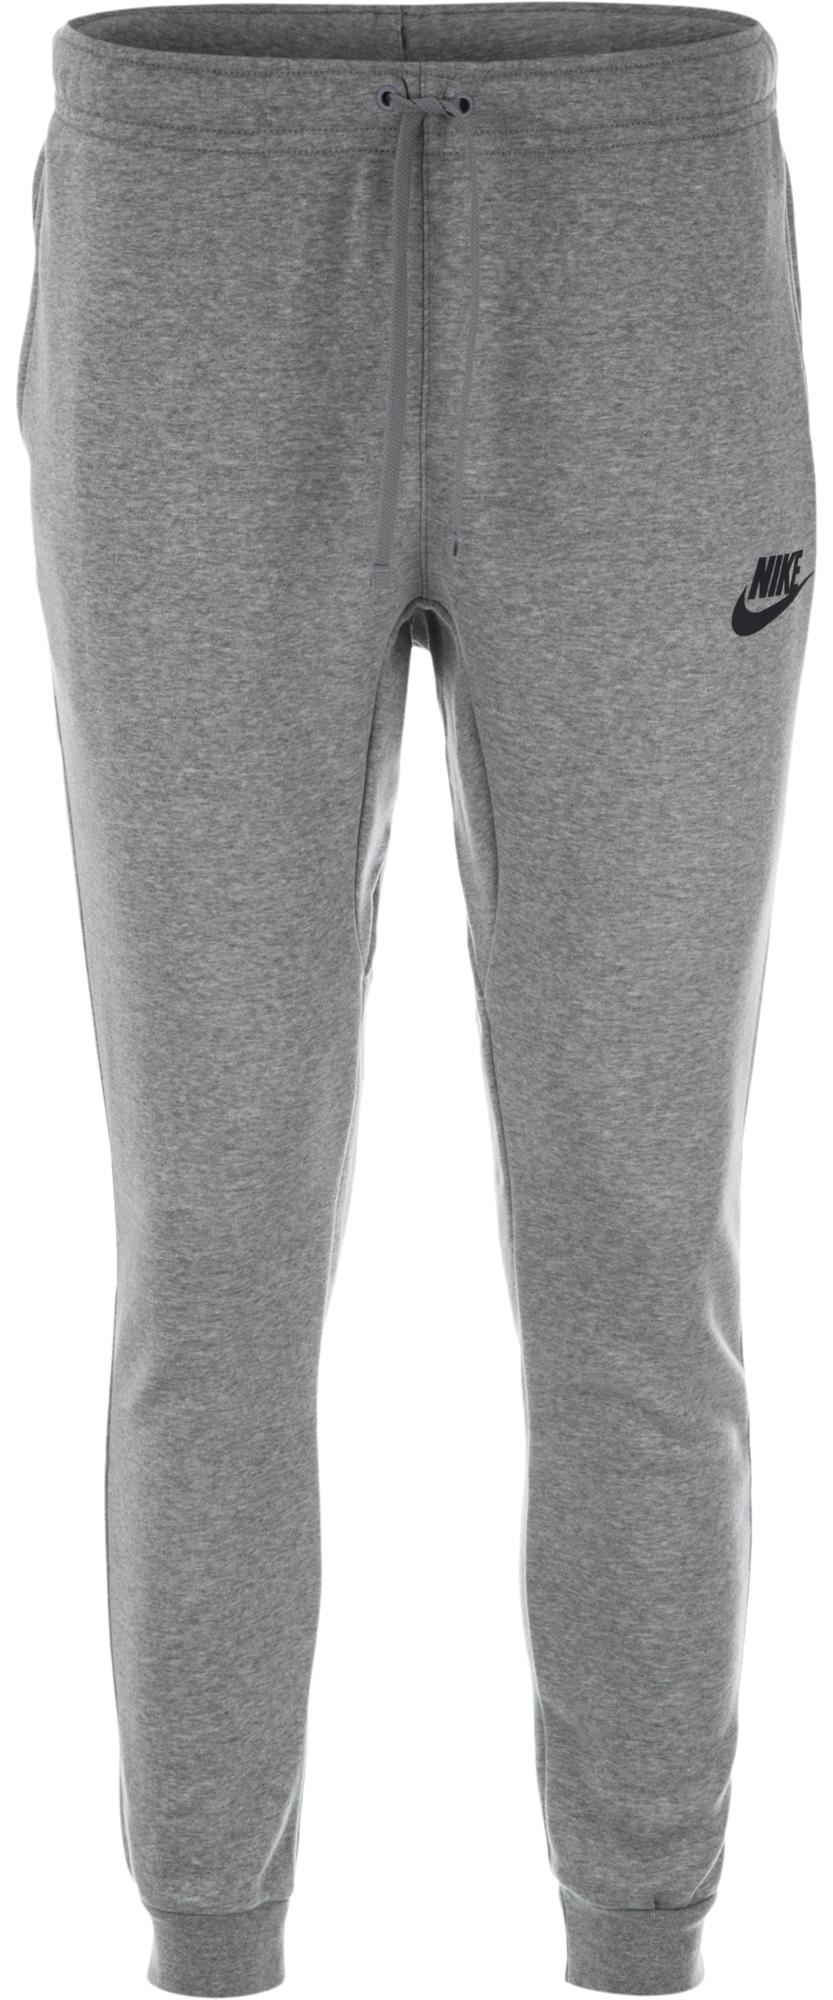 Nike Брюки мужские Nike Sportswear Joggers nike sportswear nike sportswear air force 1 low retro